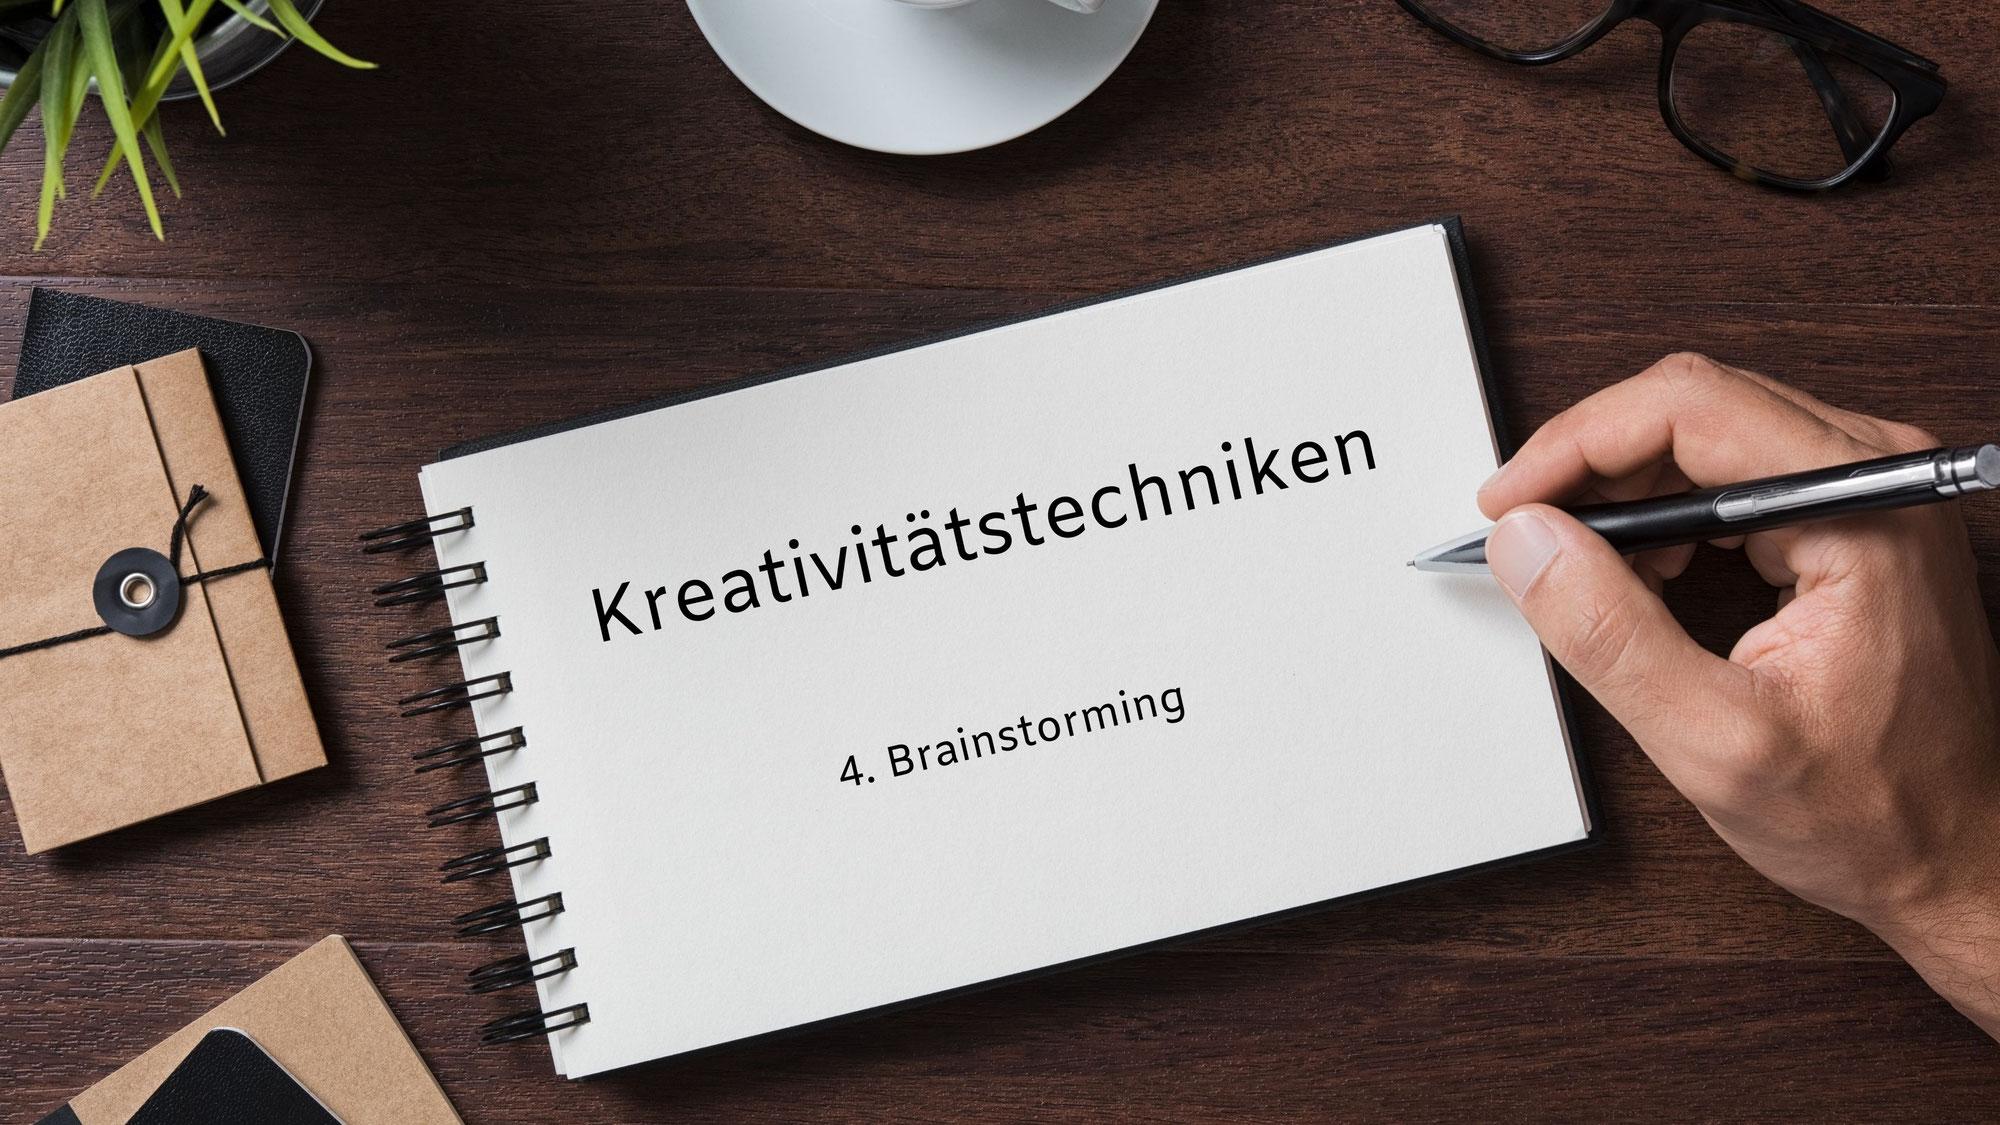 Kreativitätstechniken 4. Brainstorming